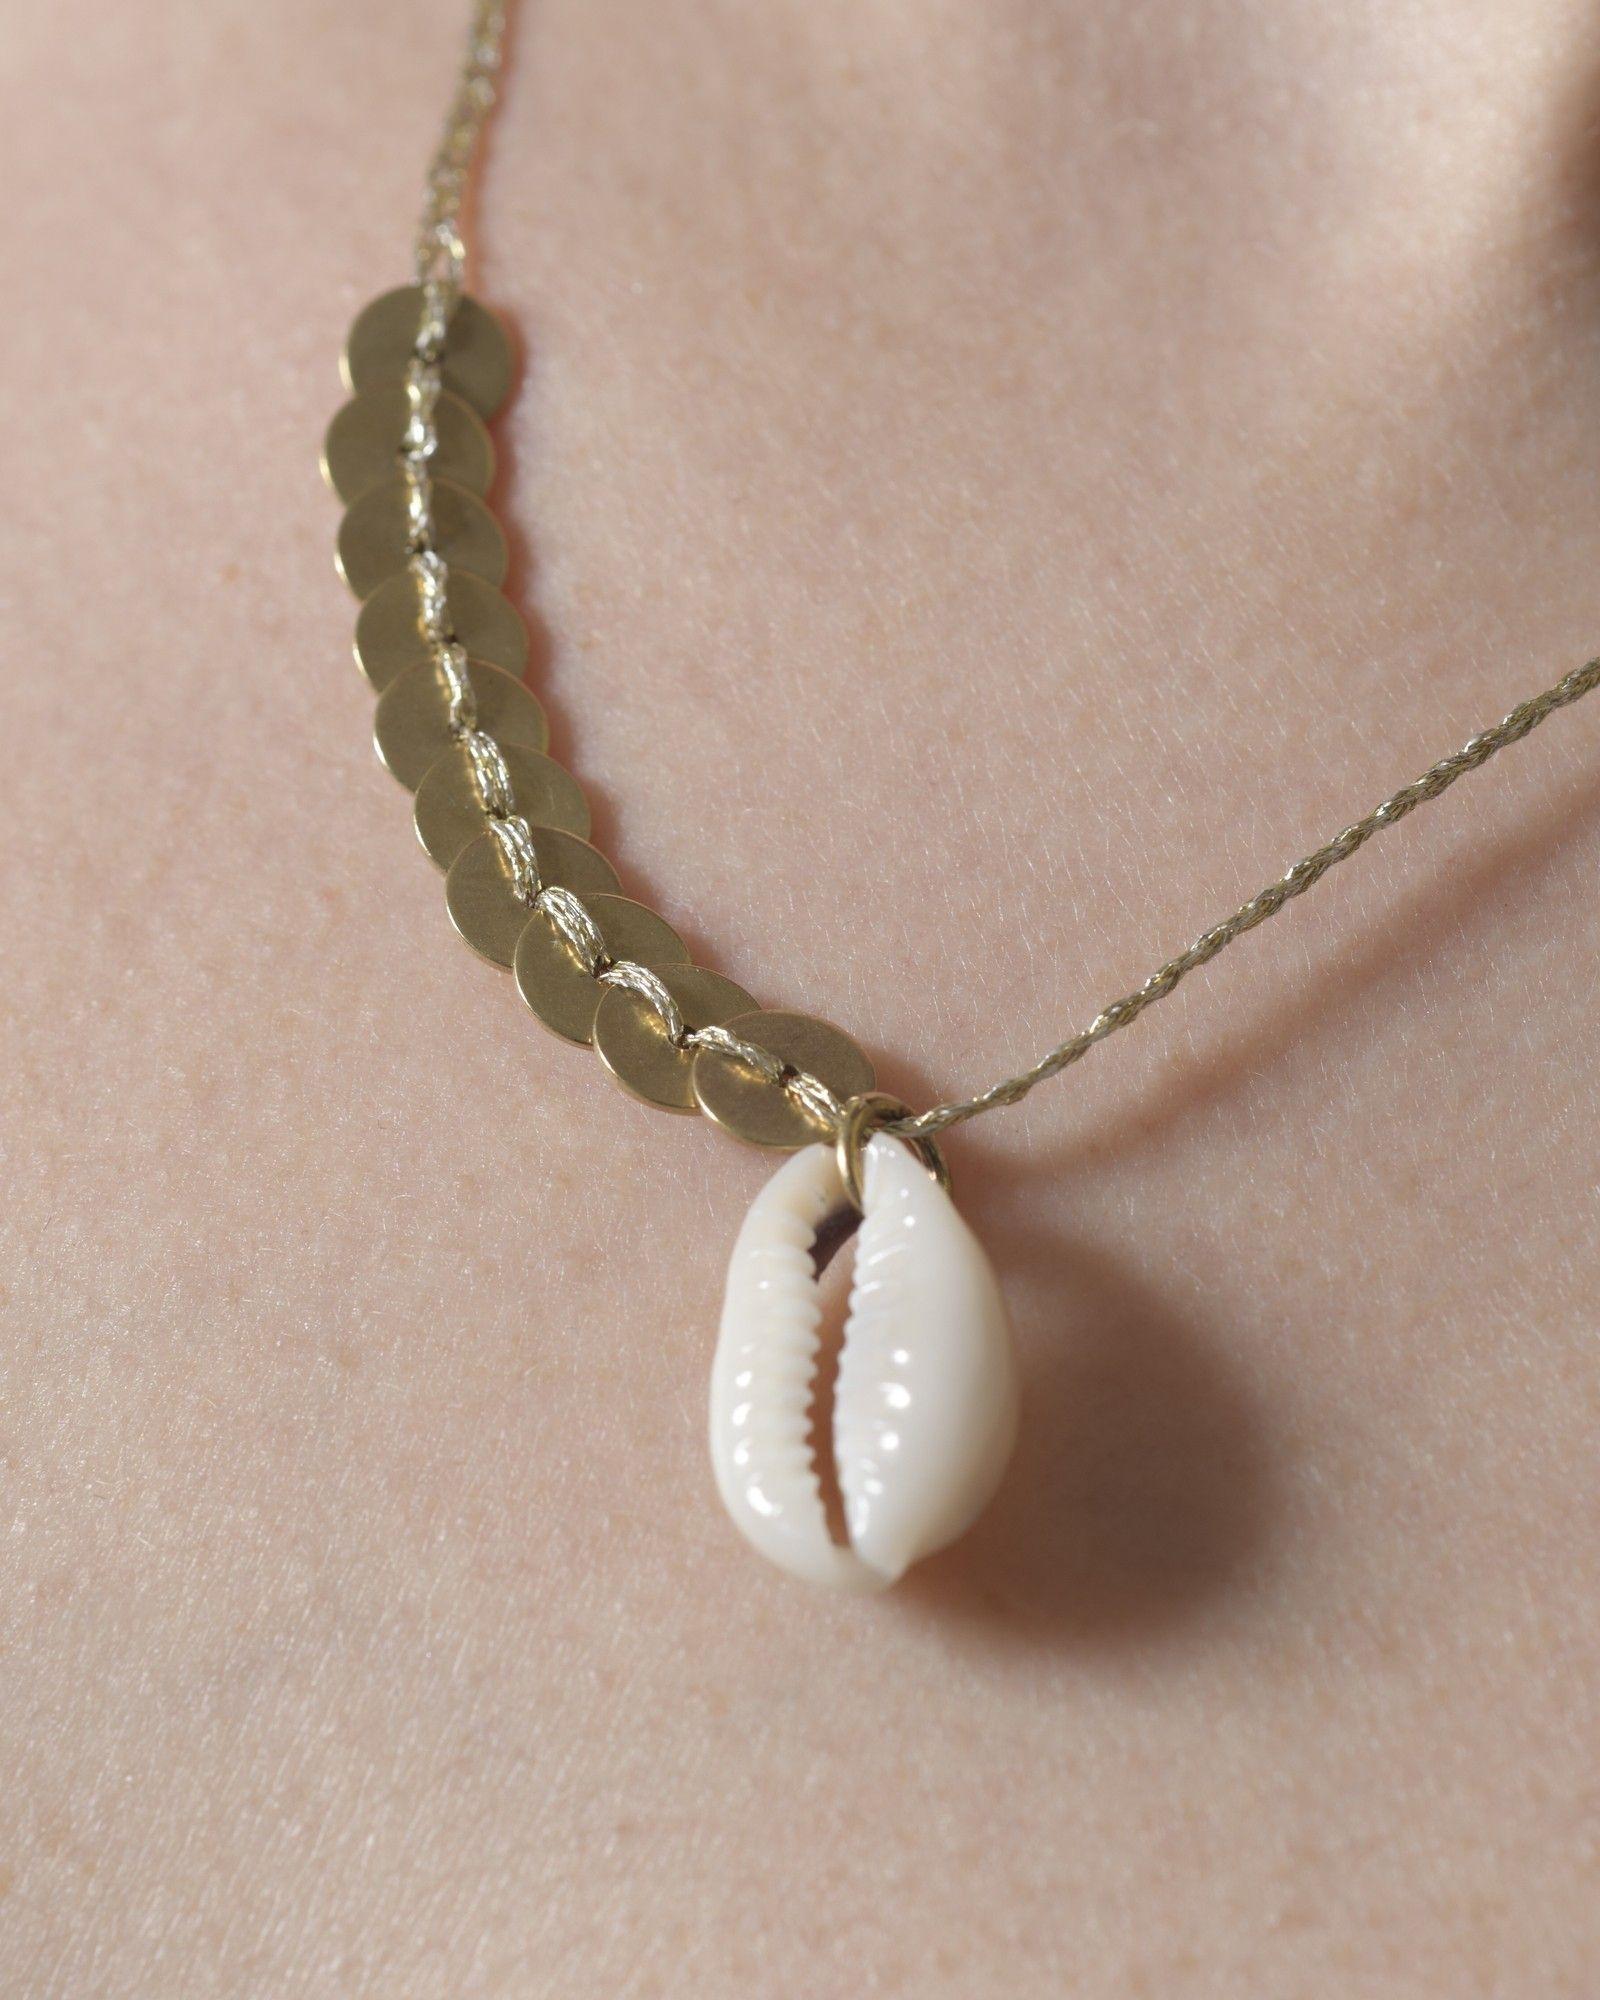 Collier doré à pendentif coquillage Polder